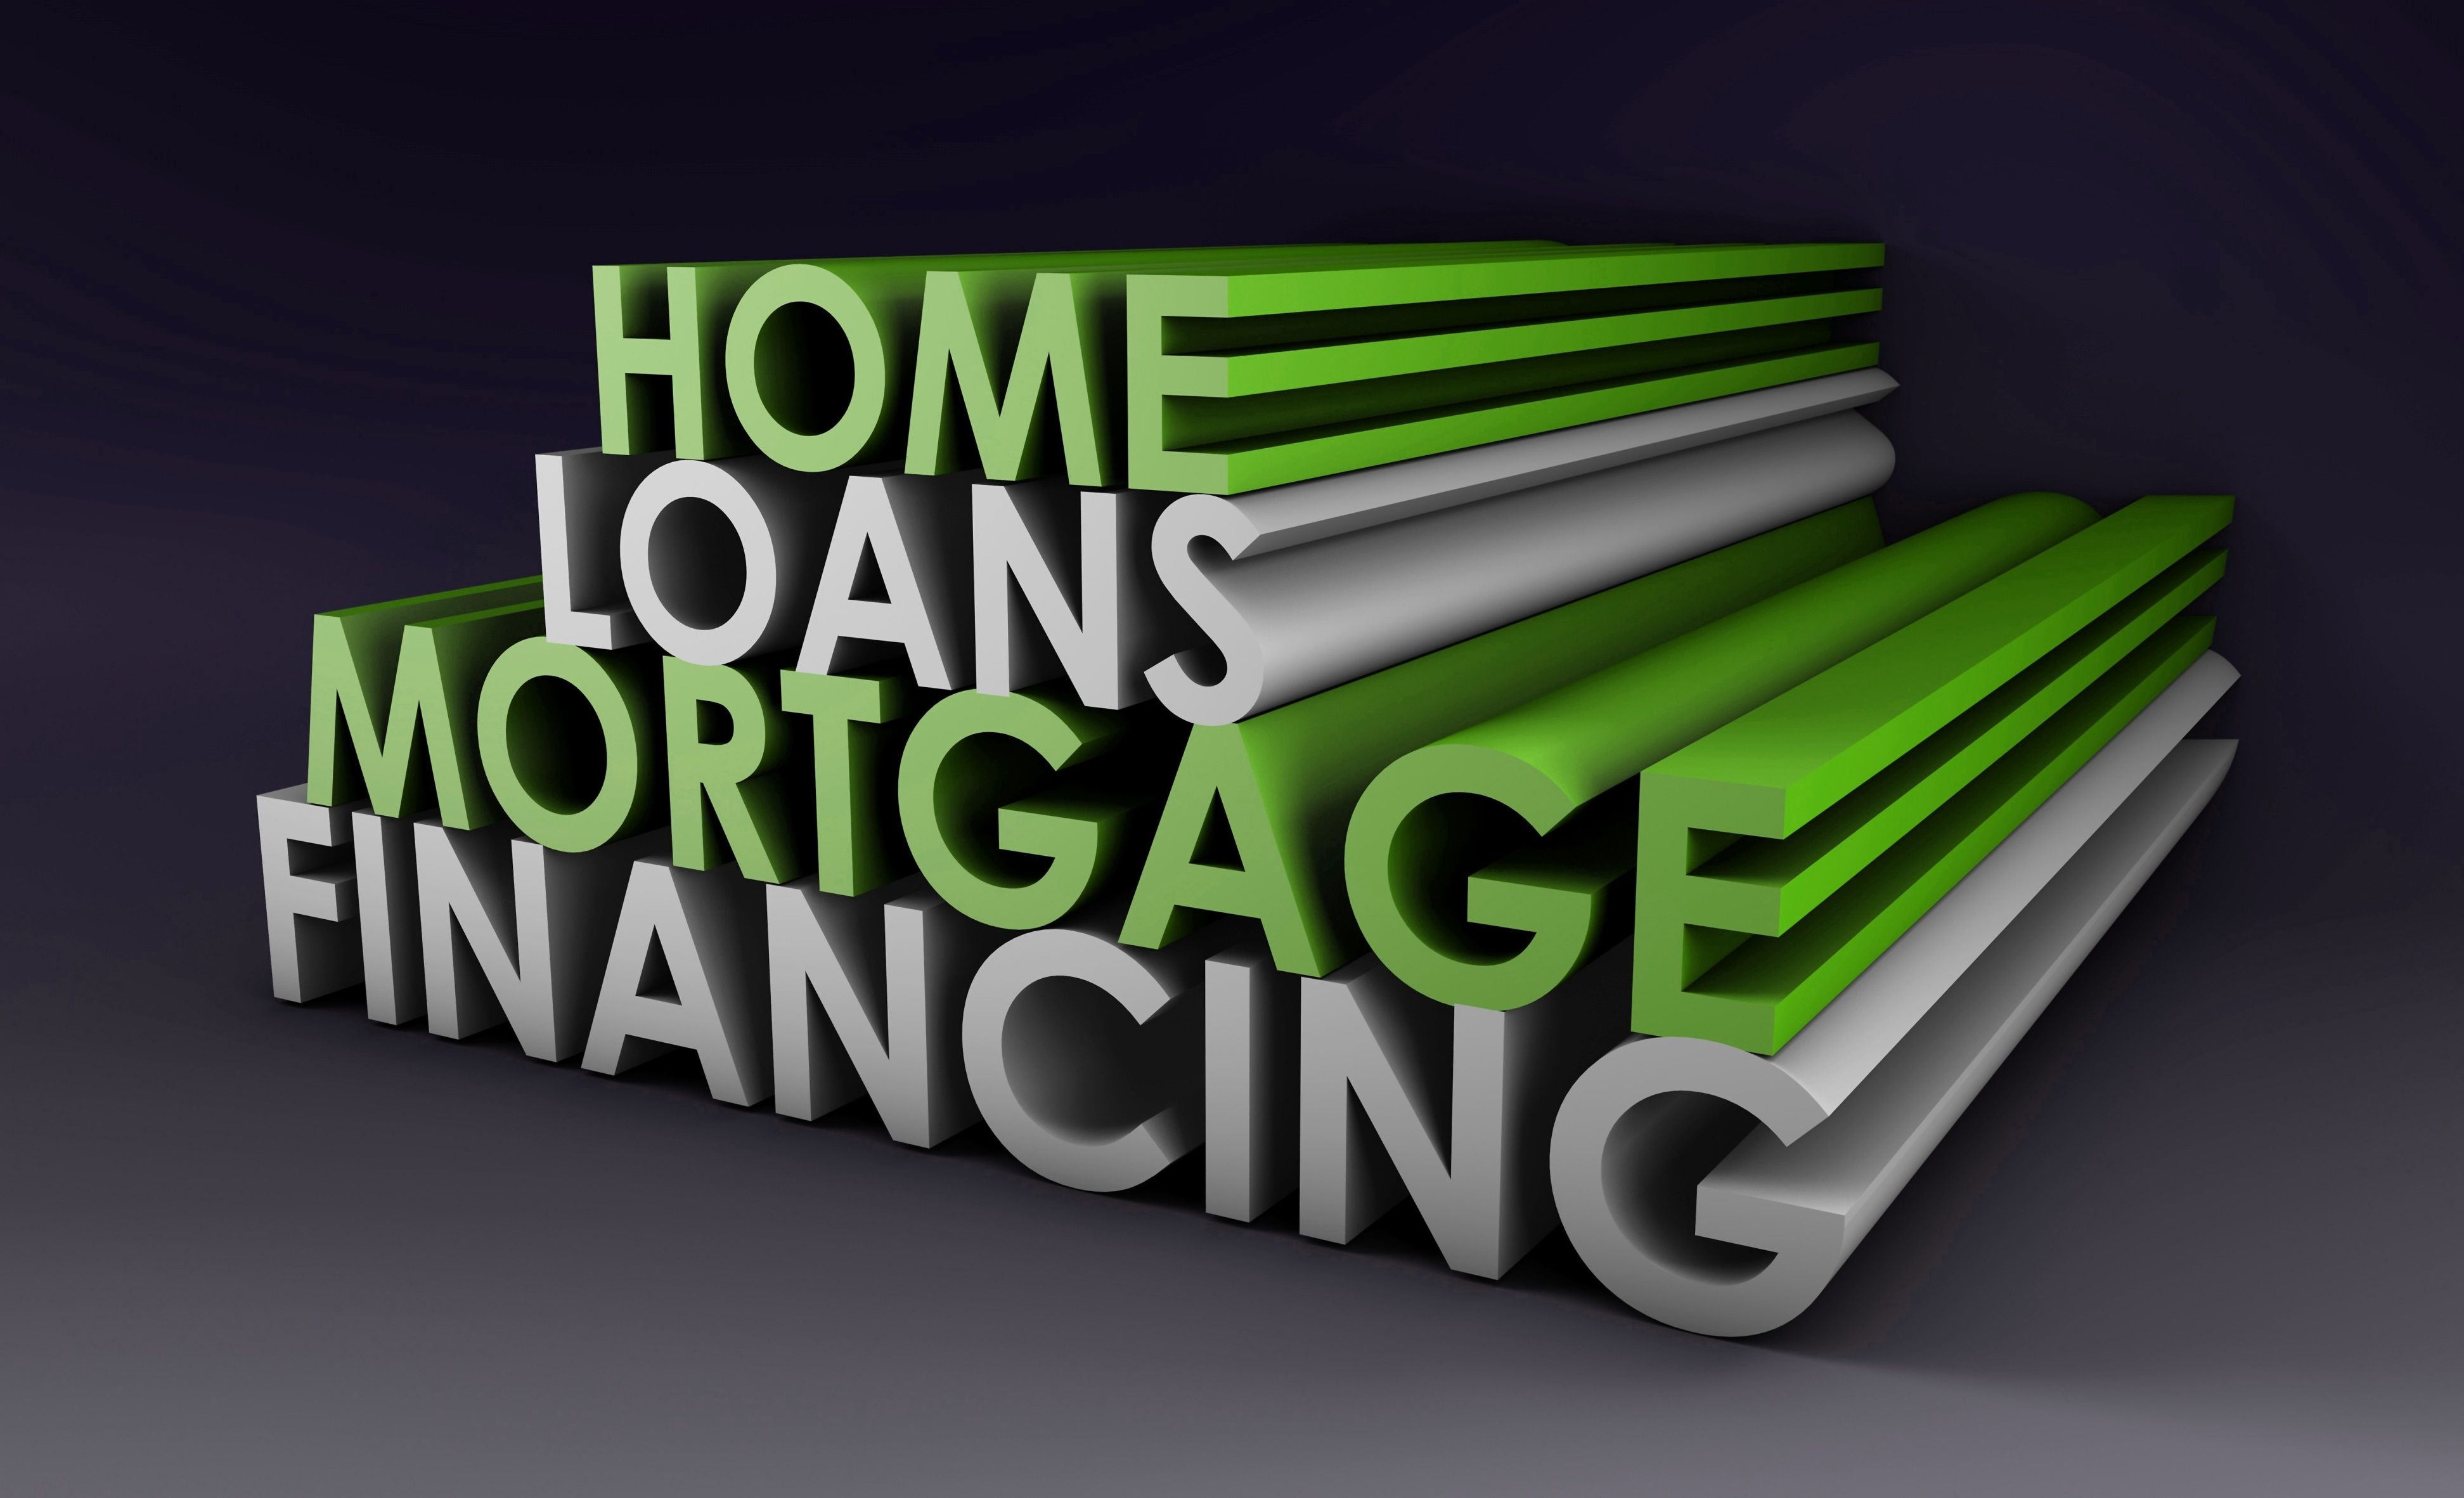 Home Loan In Jodhpur With Srg Housing Finance Homeloaninjodhpur Housingfinancecompanyinjodhpur Homeloansjodhpur Mortgage Loans Home Loans Business Loans